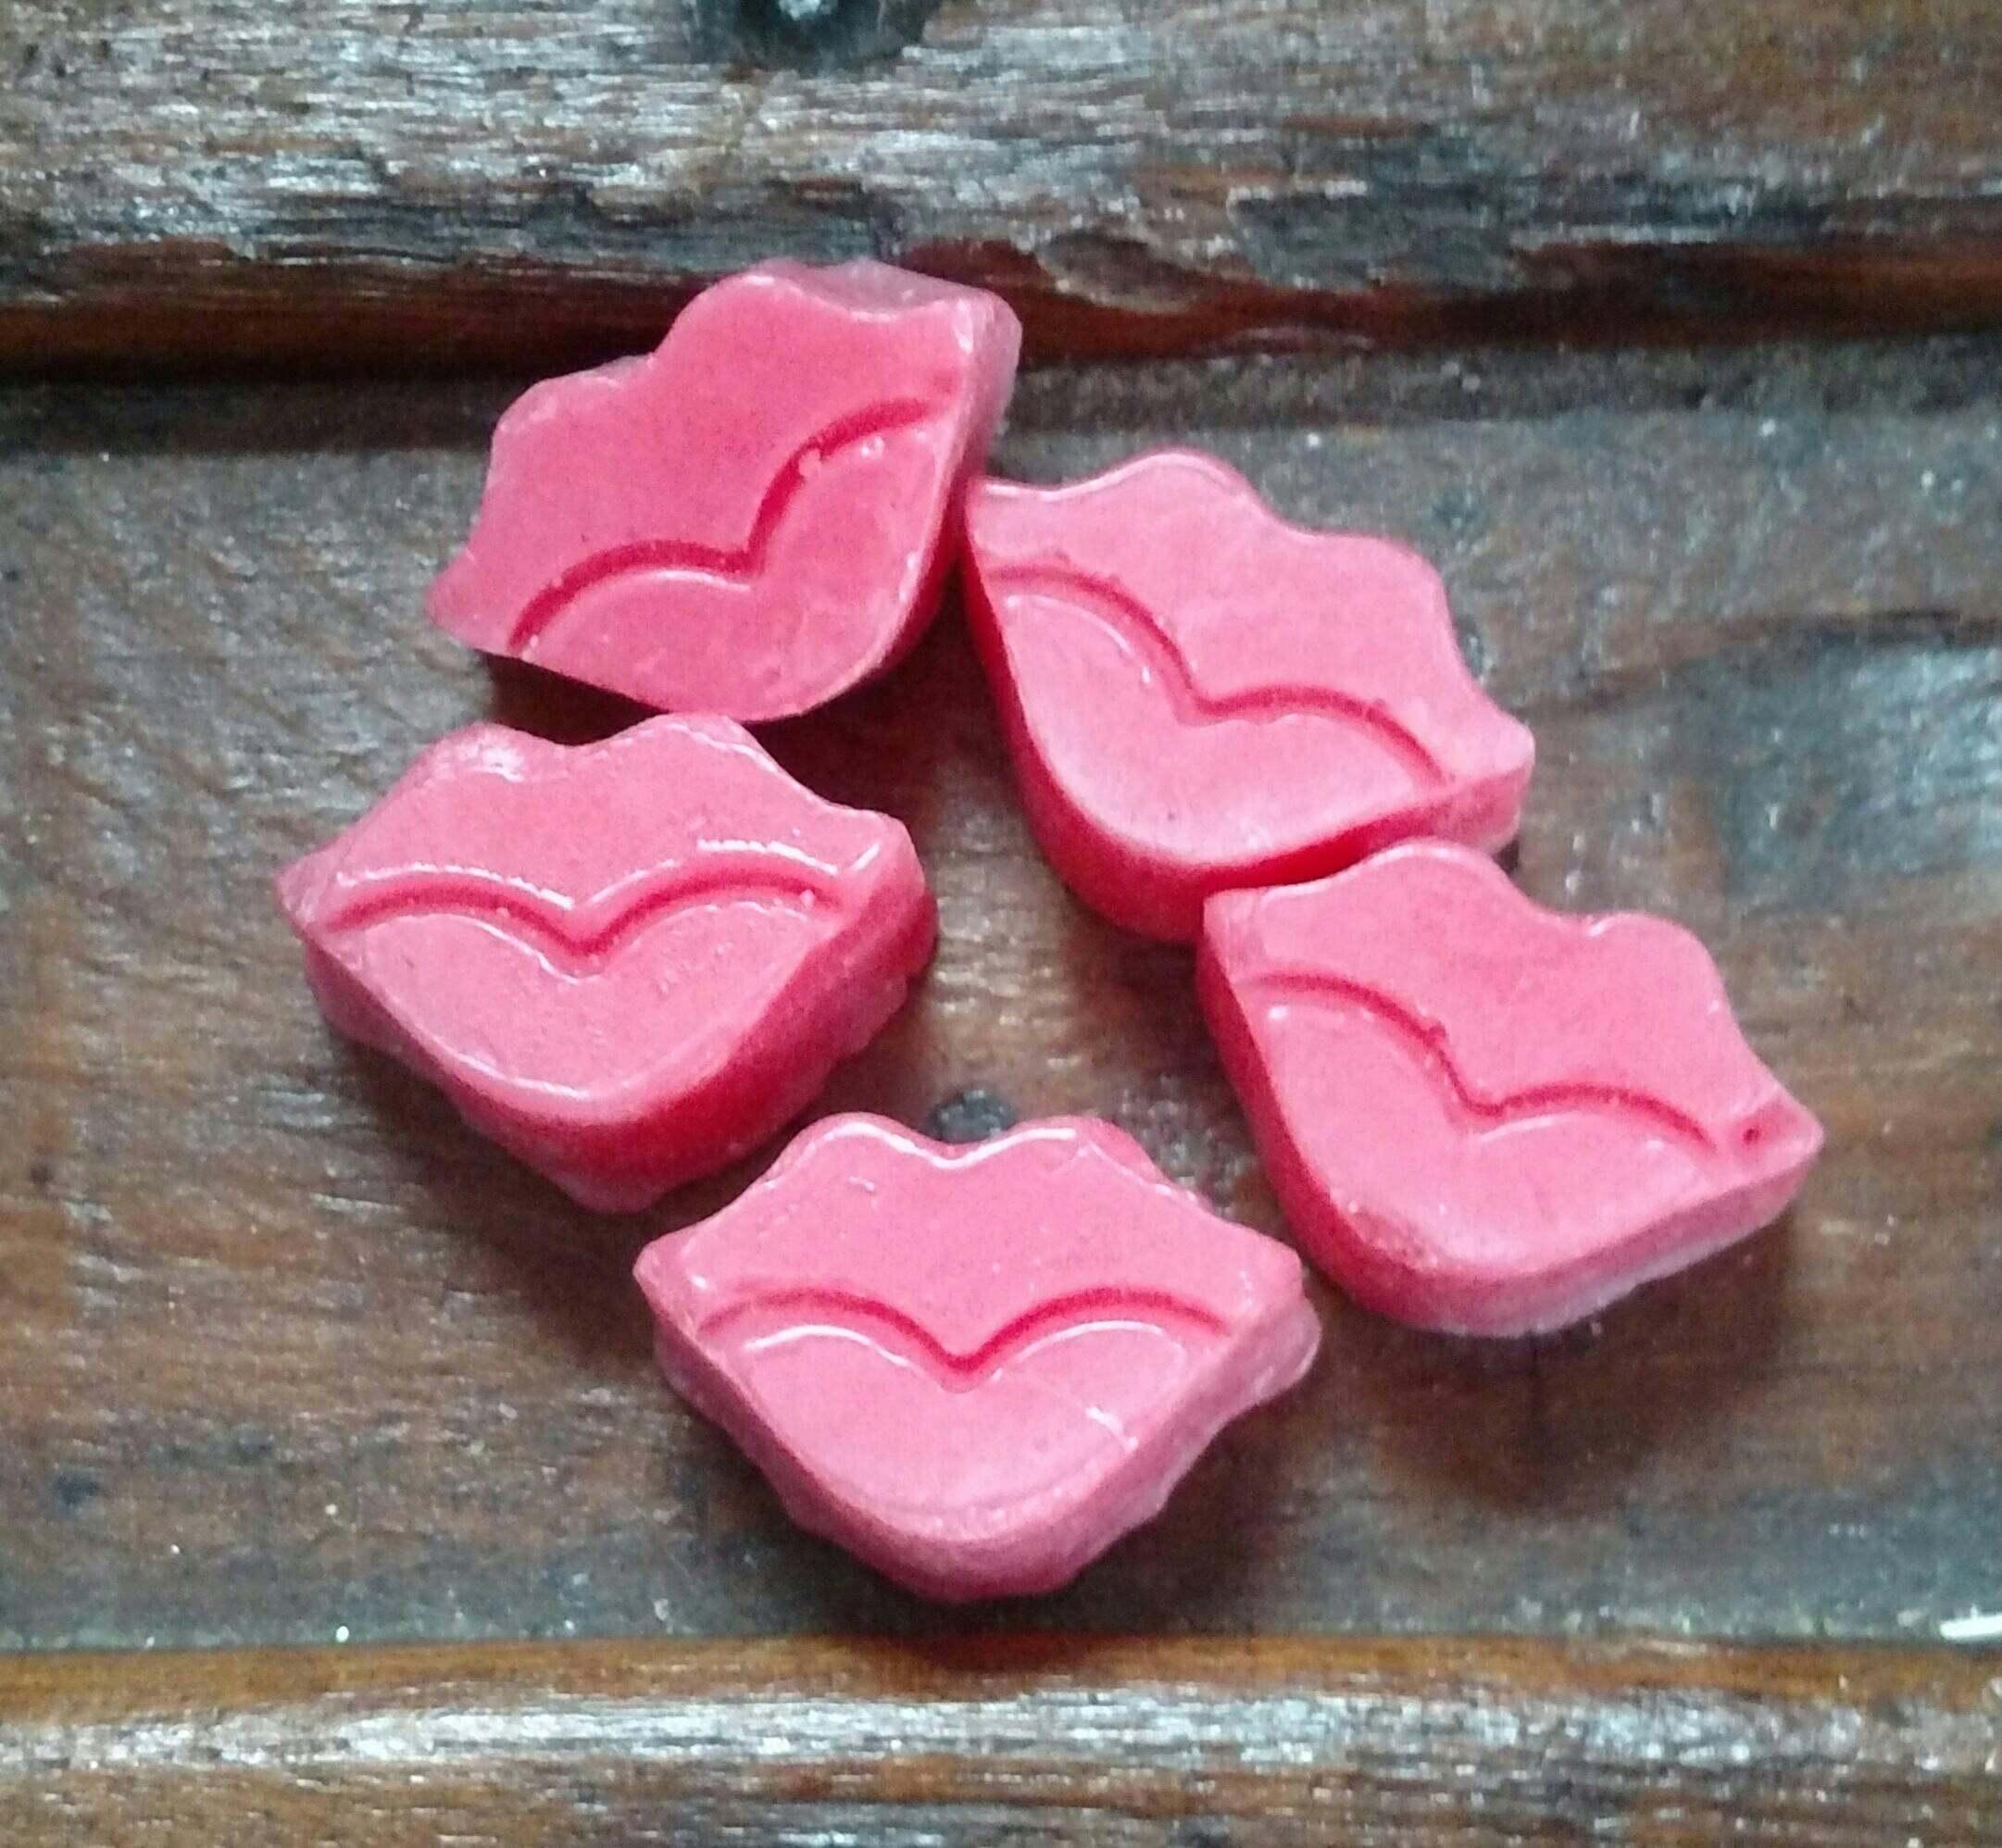 Soy Wax Melts Smooch-Lips Kissing Lips Mwah Kissing Fool | Etsy